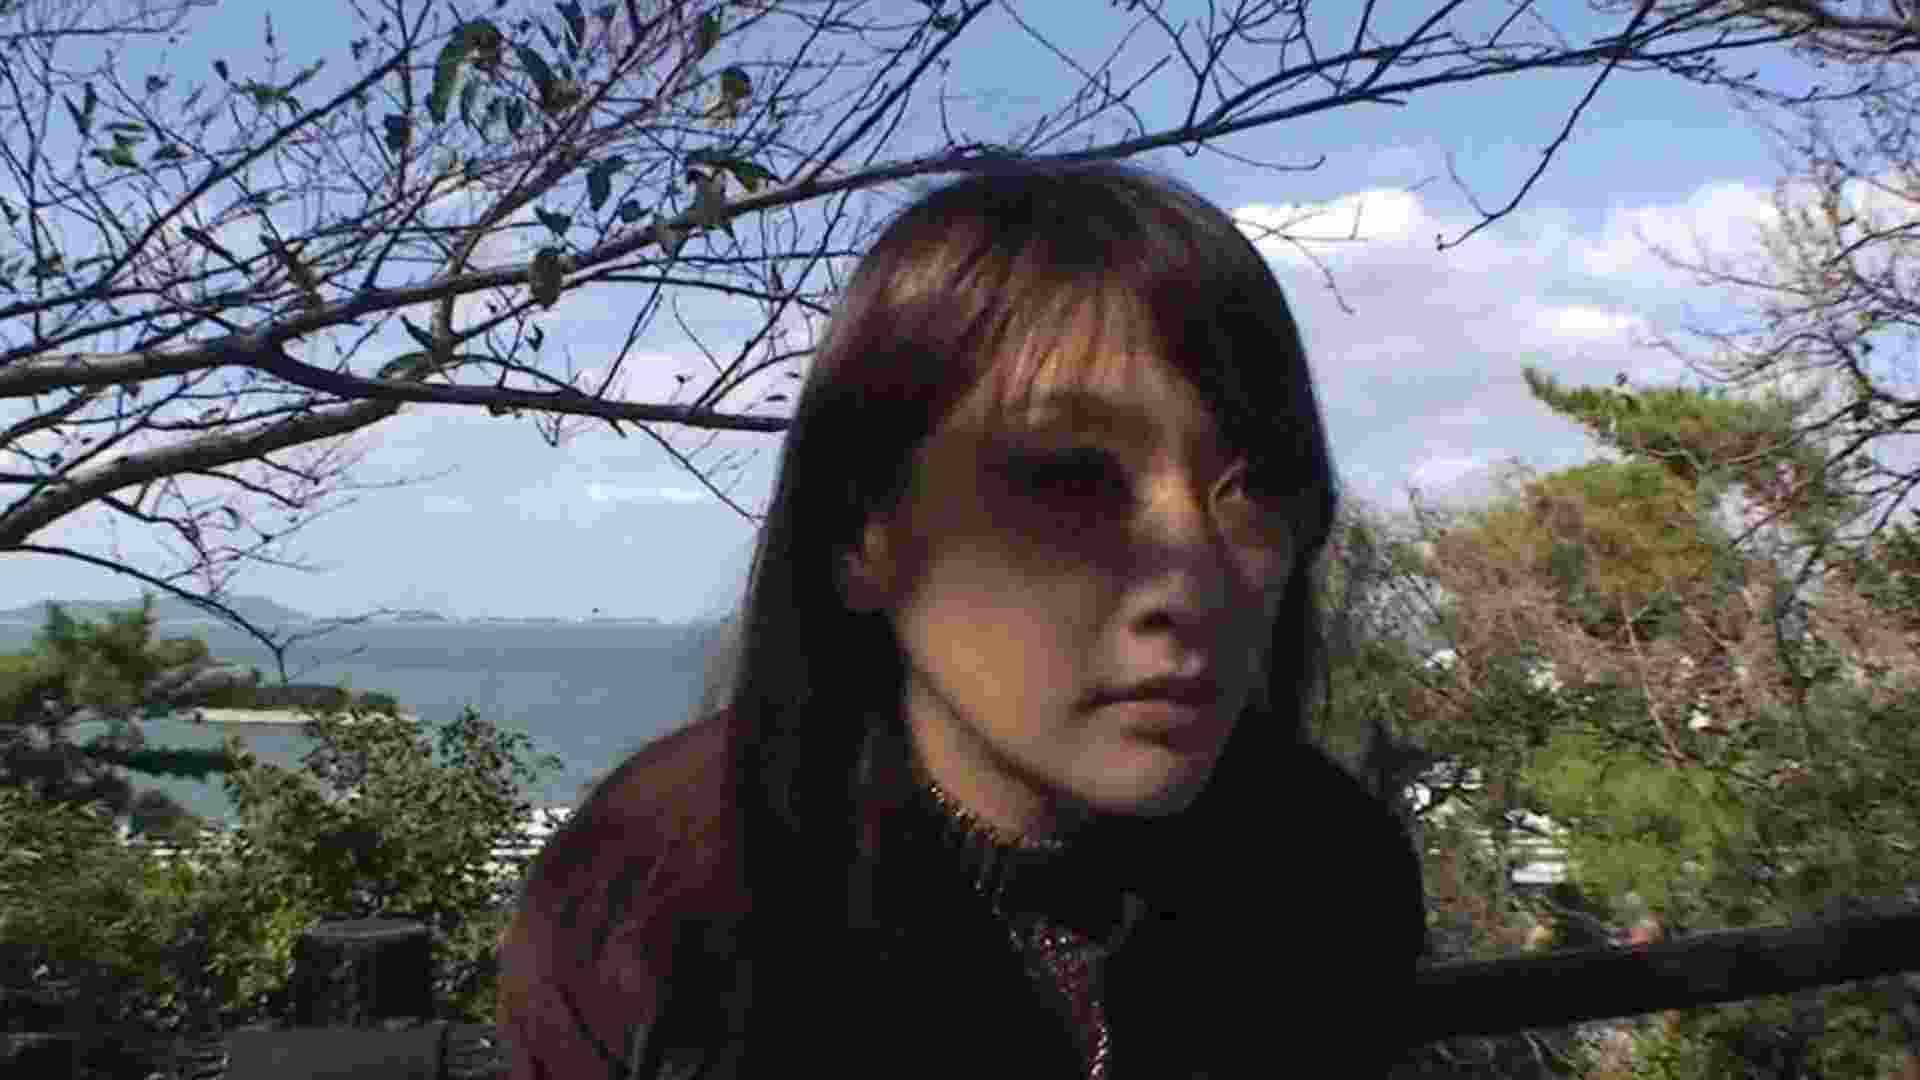 S級厳選美女ビッチガールVol.03 ナース 覗き性交動画流出 80画像 11